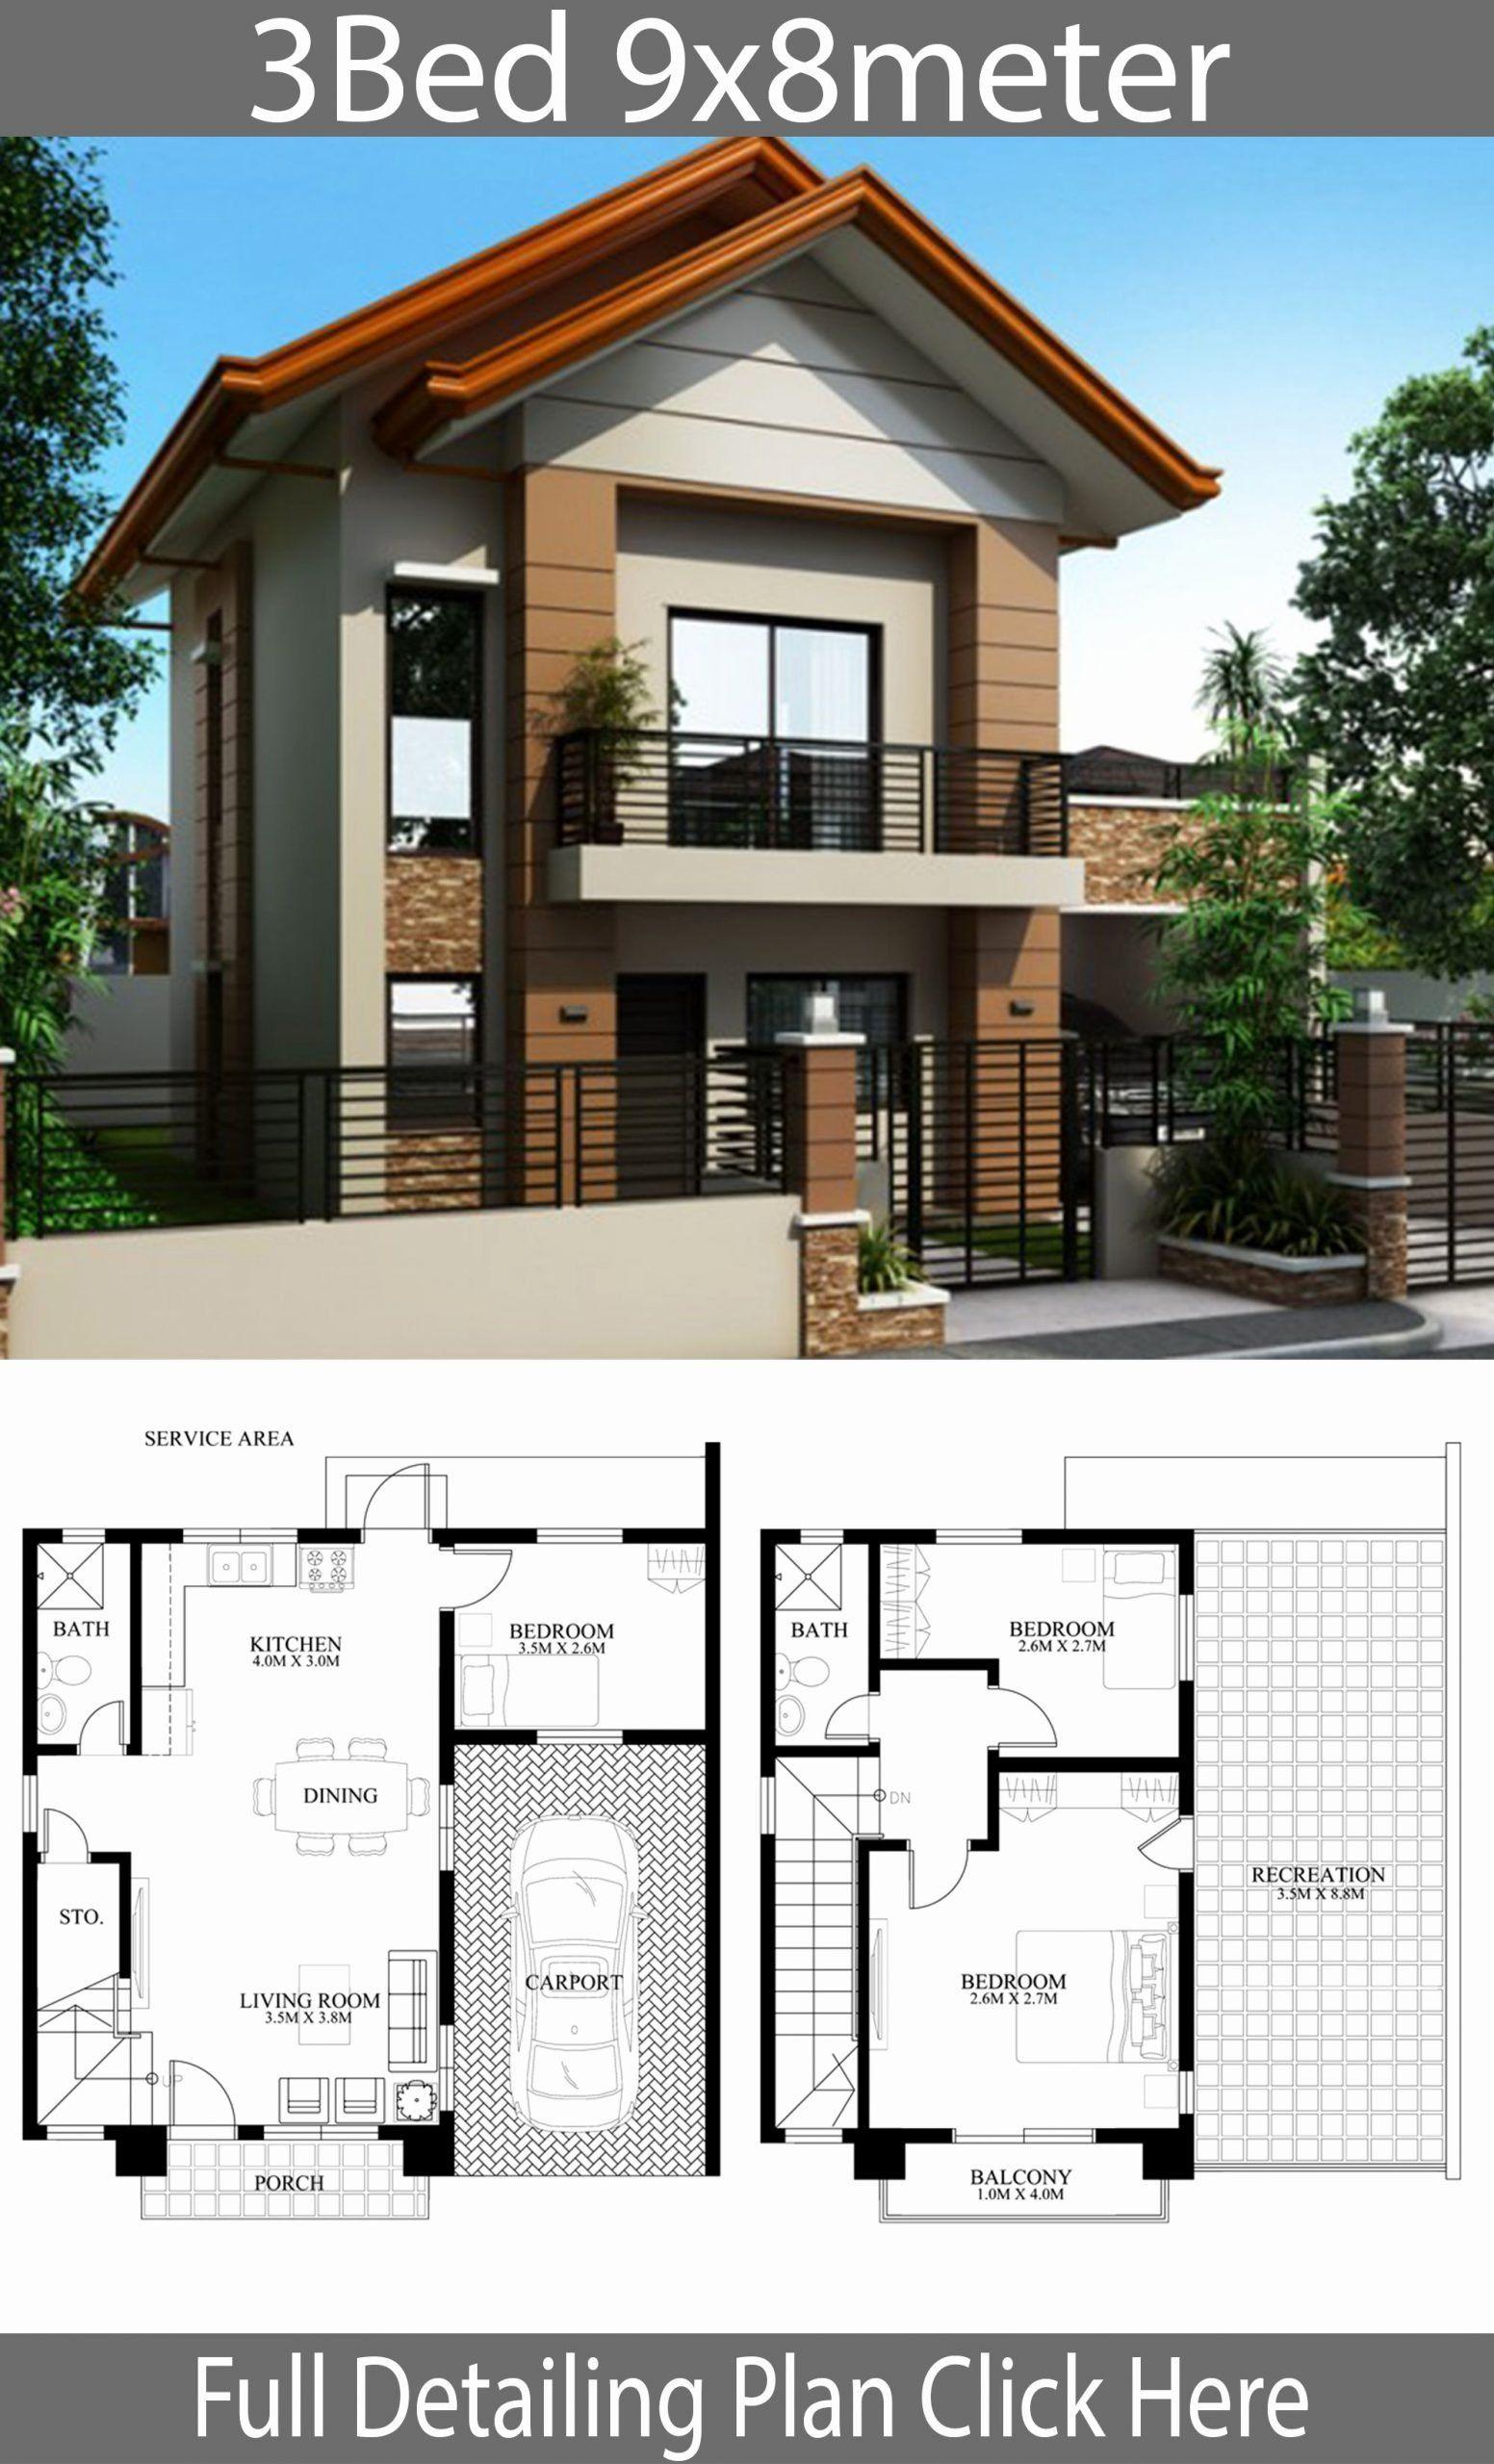 Sims 3 Modern House Ideas Elegant 5 Home Plan Ideas 8x13m 9x8m 10x13m 11x12m Arsitektur Arsitektur Modern Rumah Pedesaan